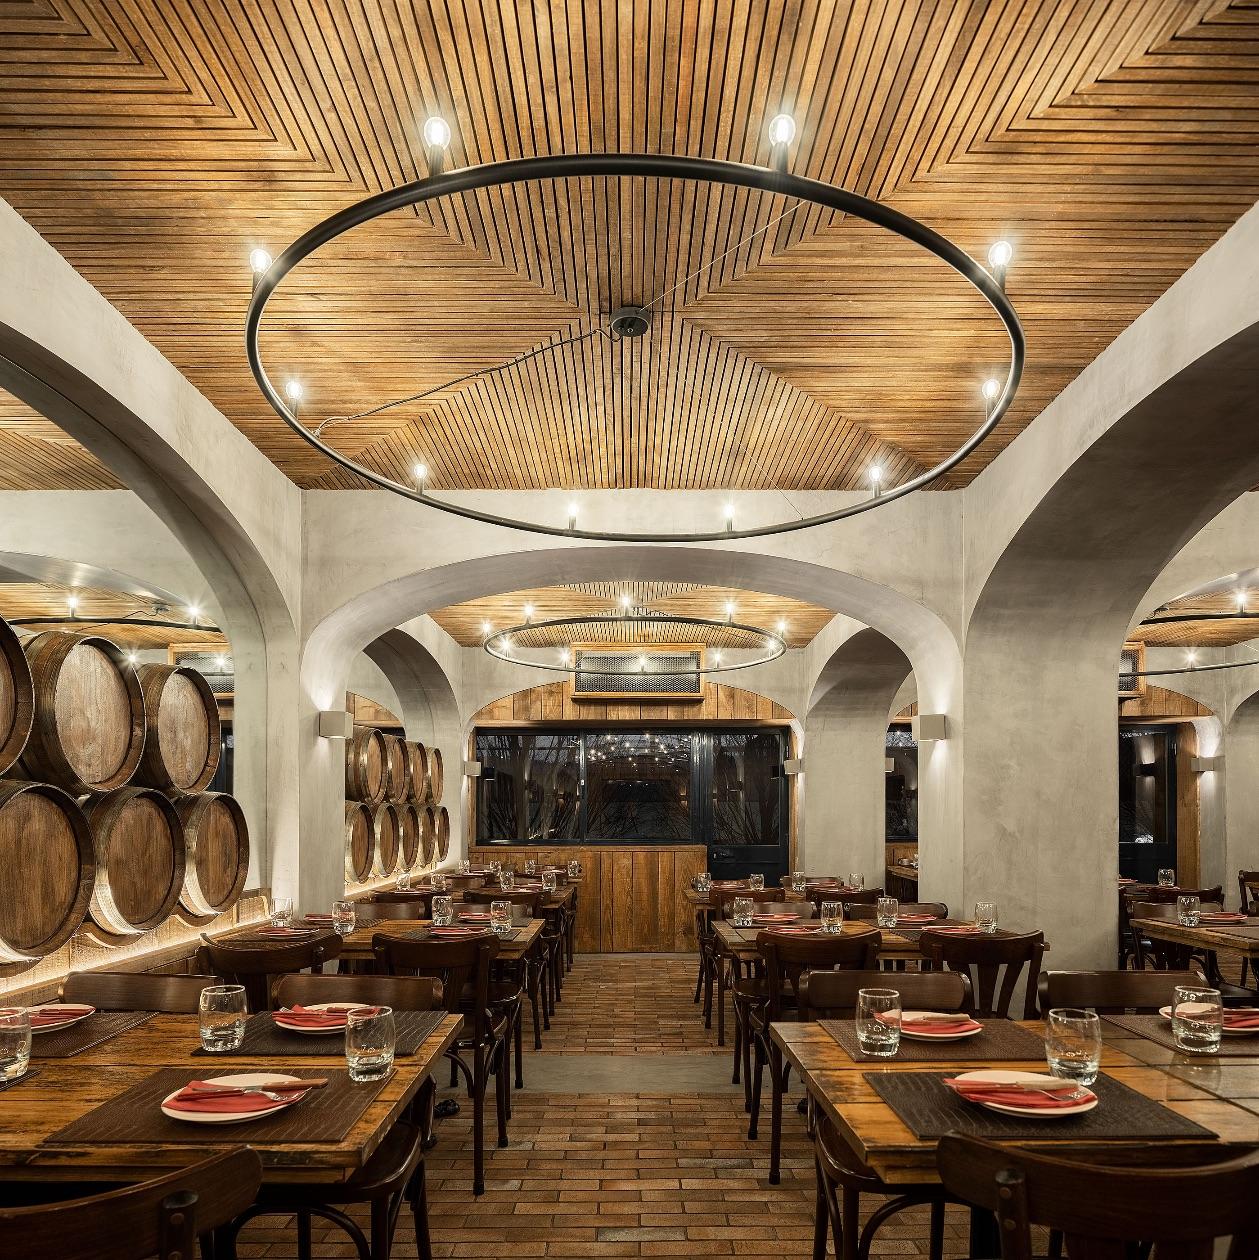 11_BARRIL Restaurant_PAULO MERLINI Architects_Inspirationist